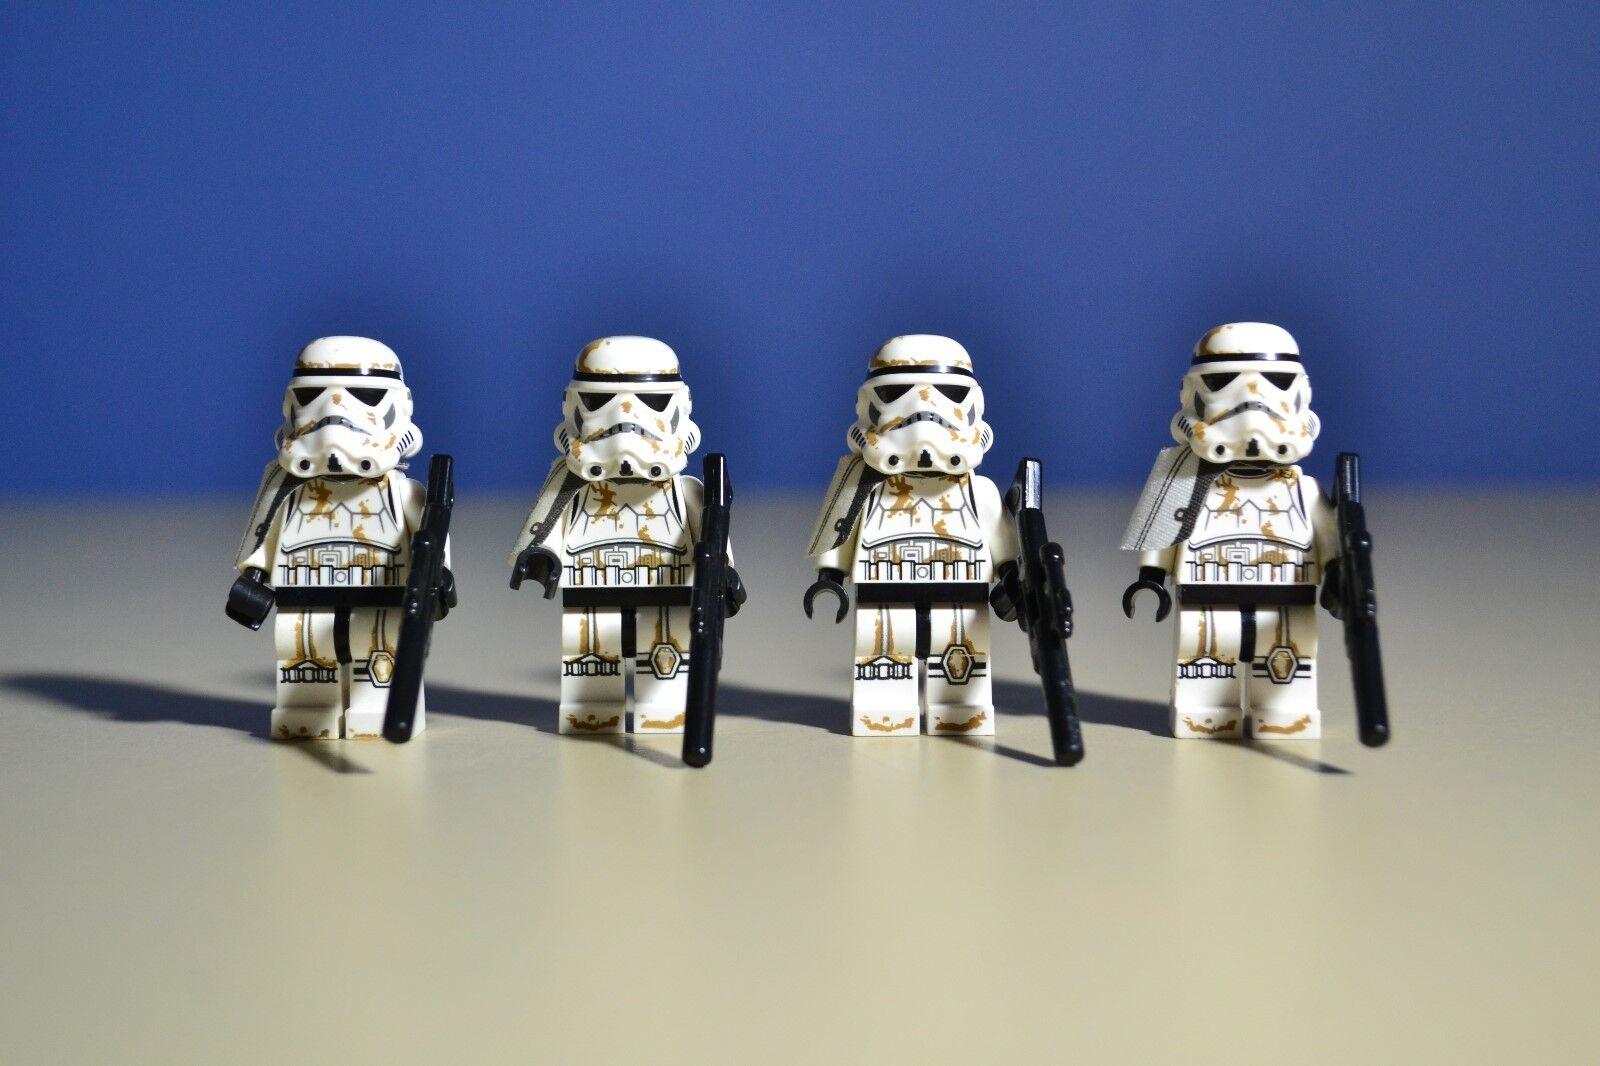 Lego Star Wars Sandtrooper Sergeant  Minifigures Lot x 4  White 9490 W Guns